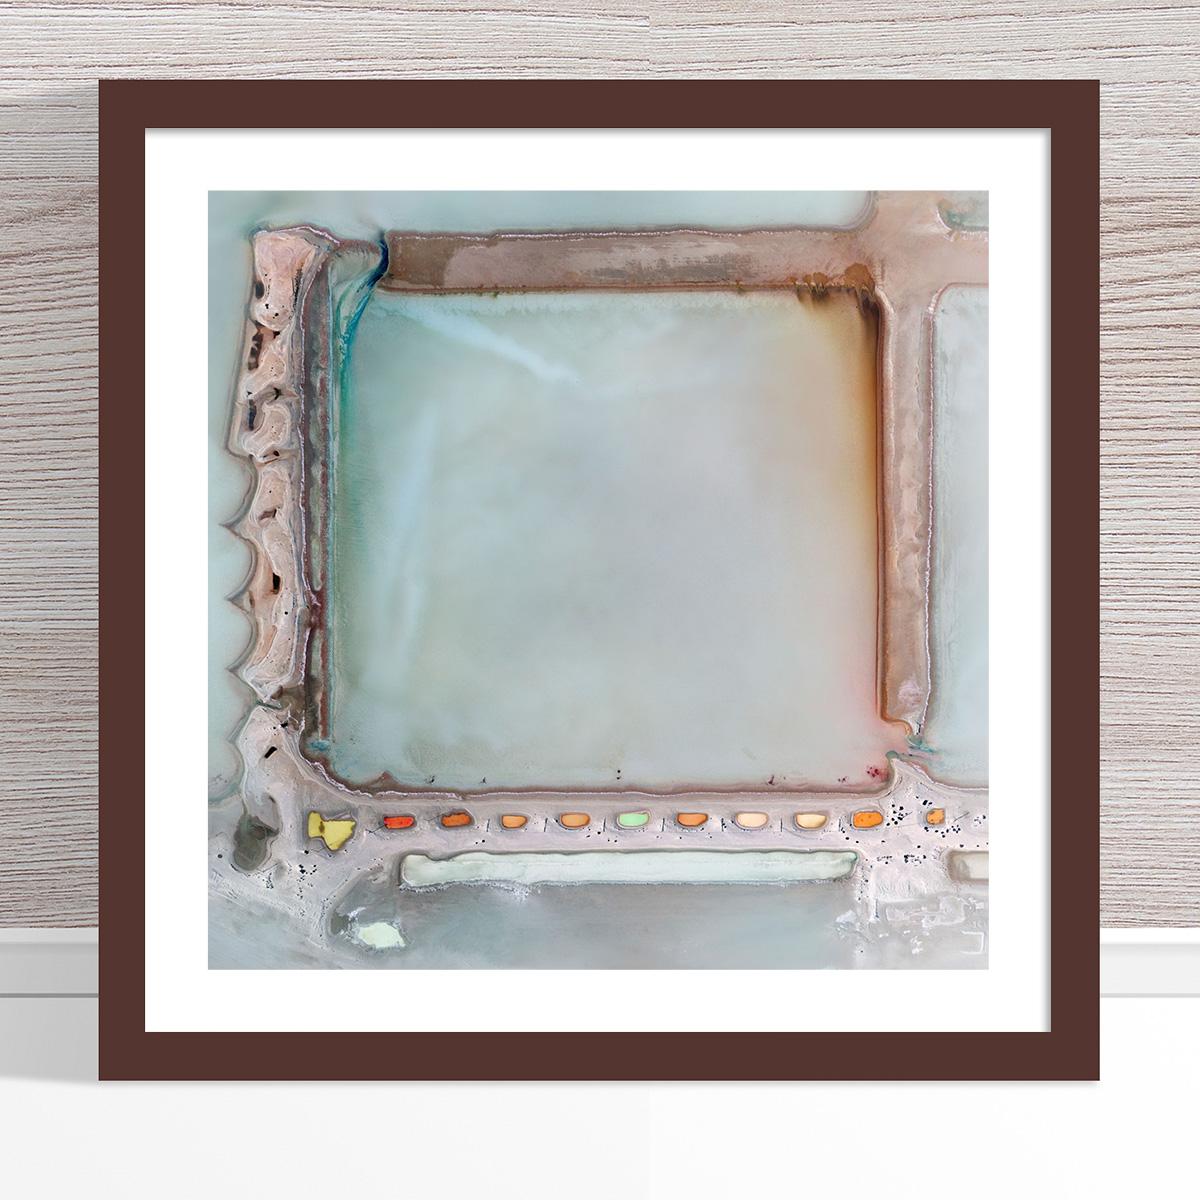 Chris Saunders - 'Aerial Salt 022' Dark Frame